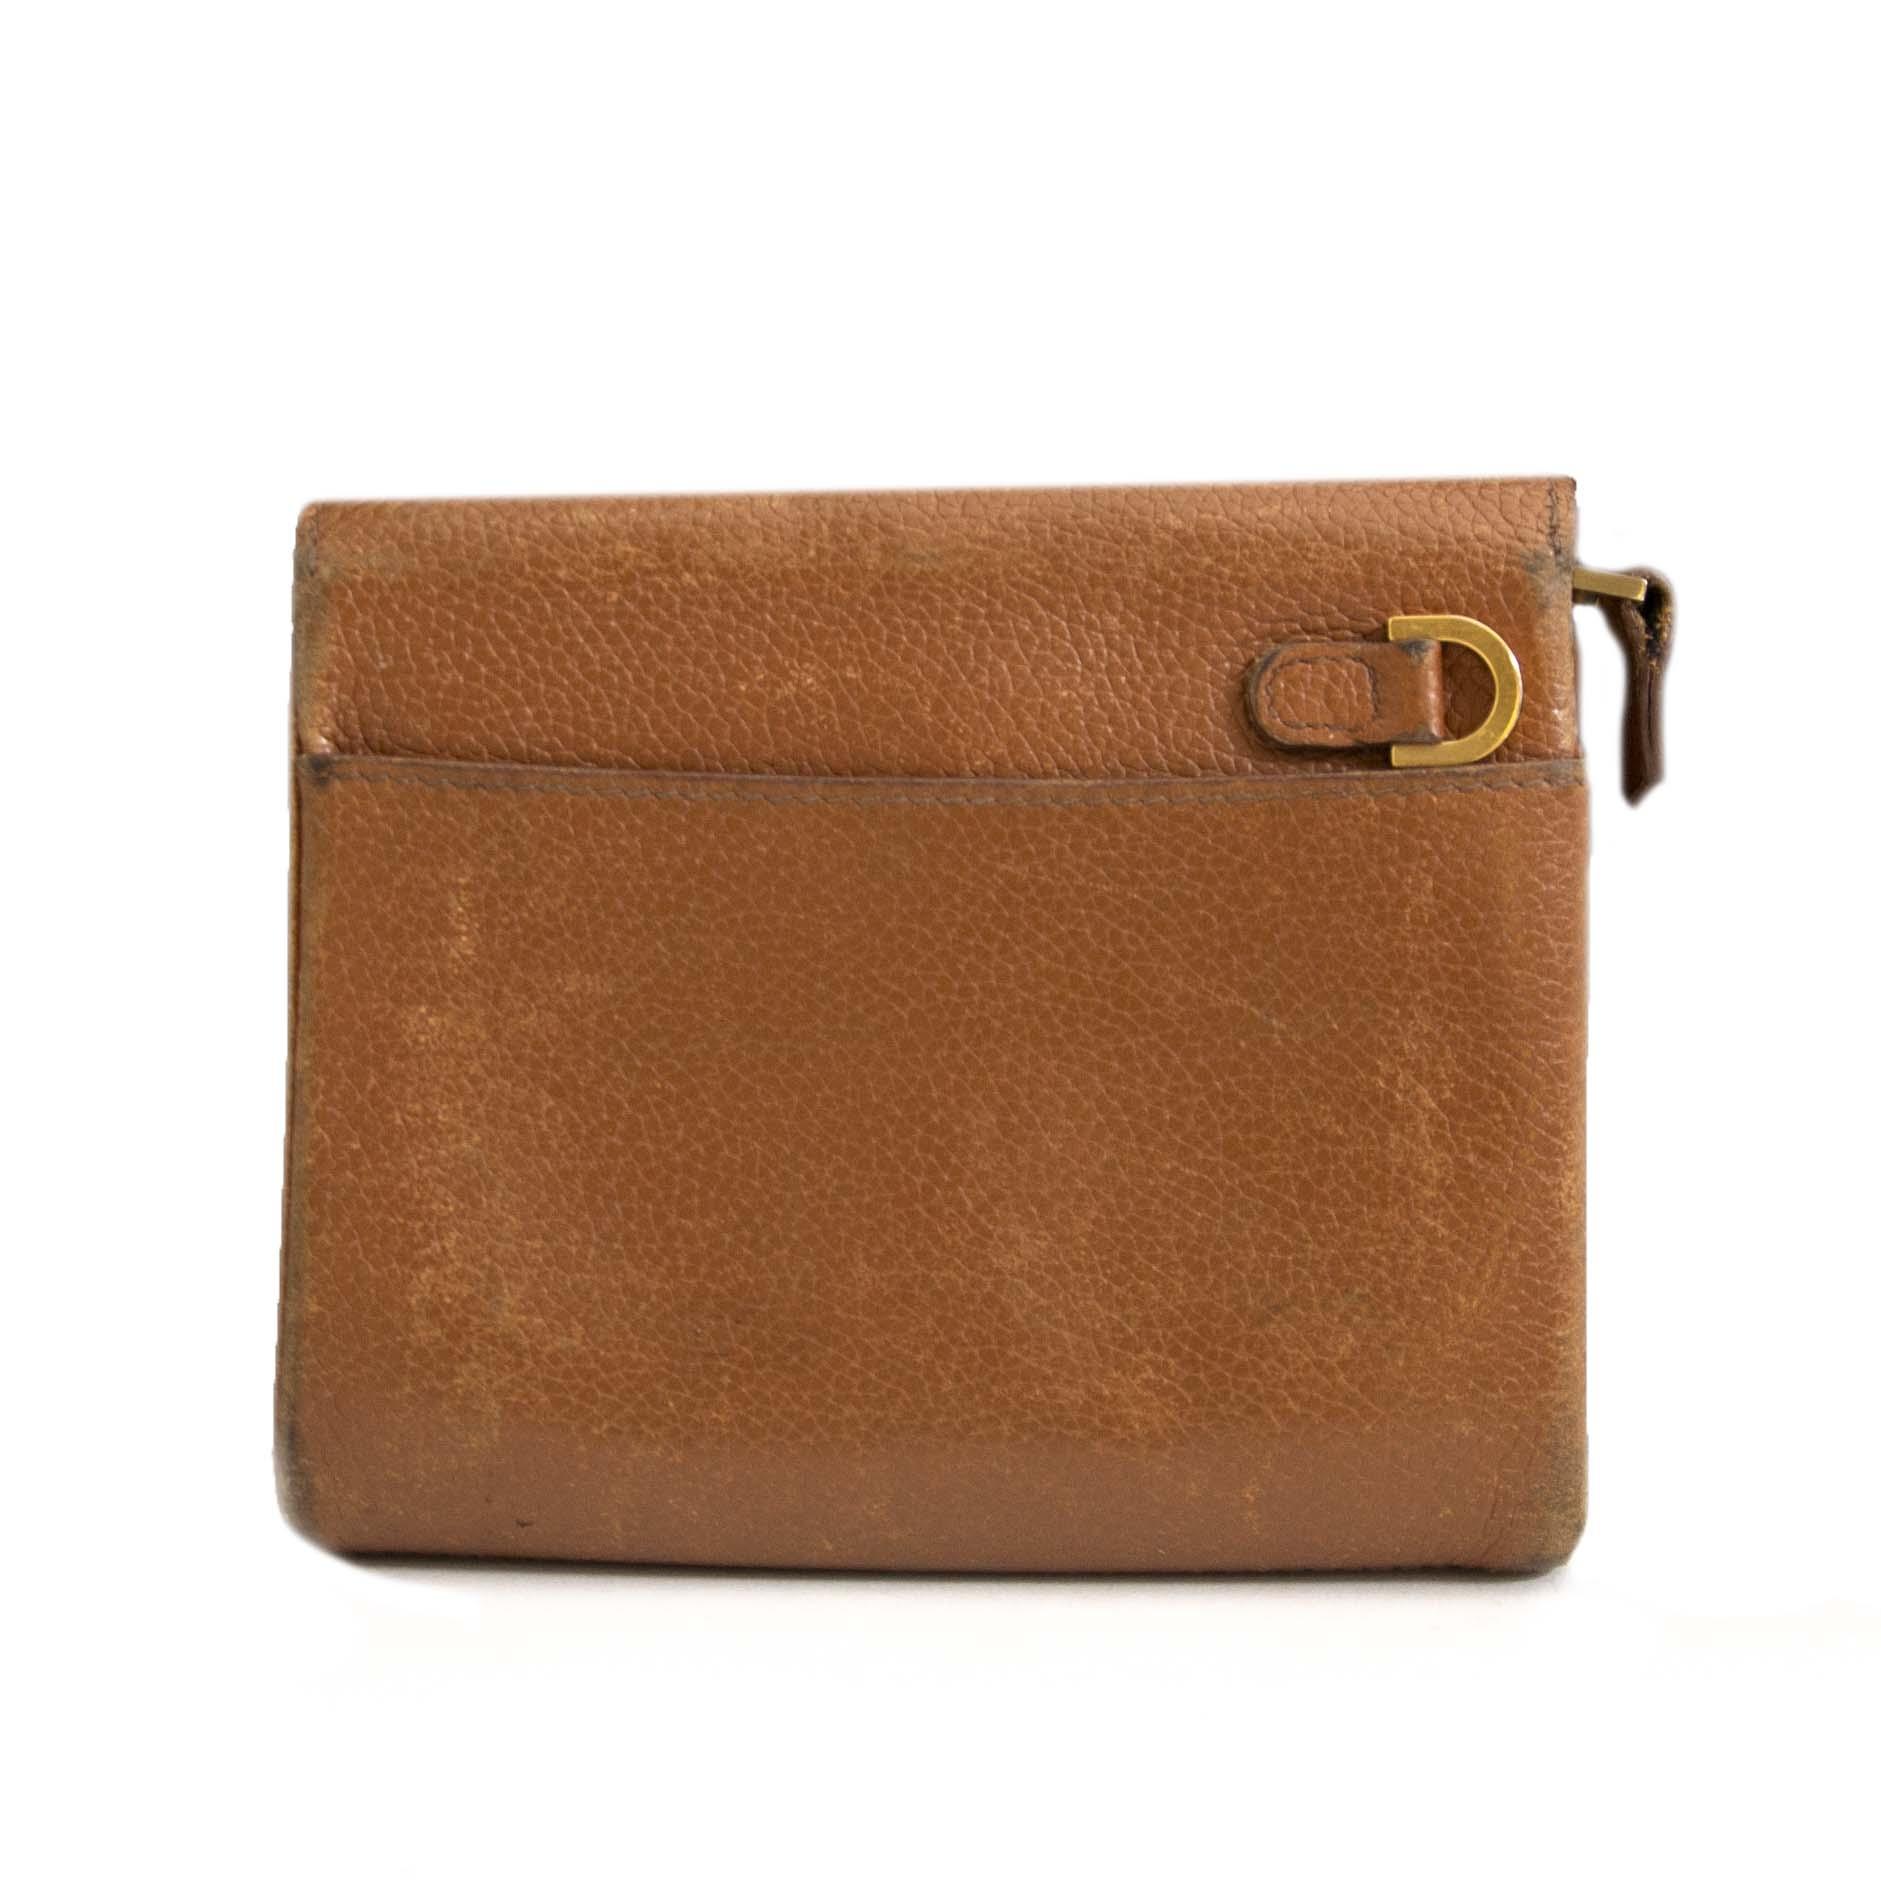 Authentic second hand vintage Delvaux Camel Wallet online webshop LabelLOV